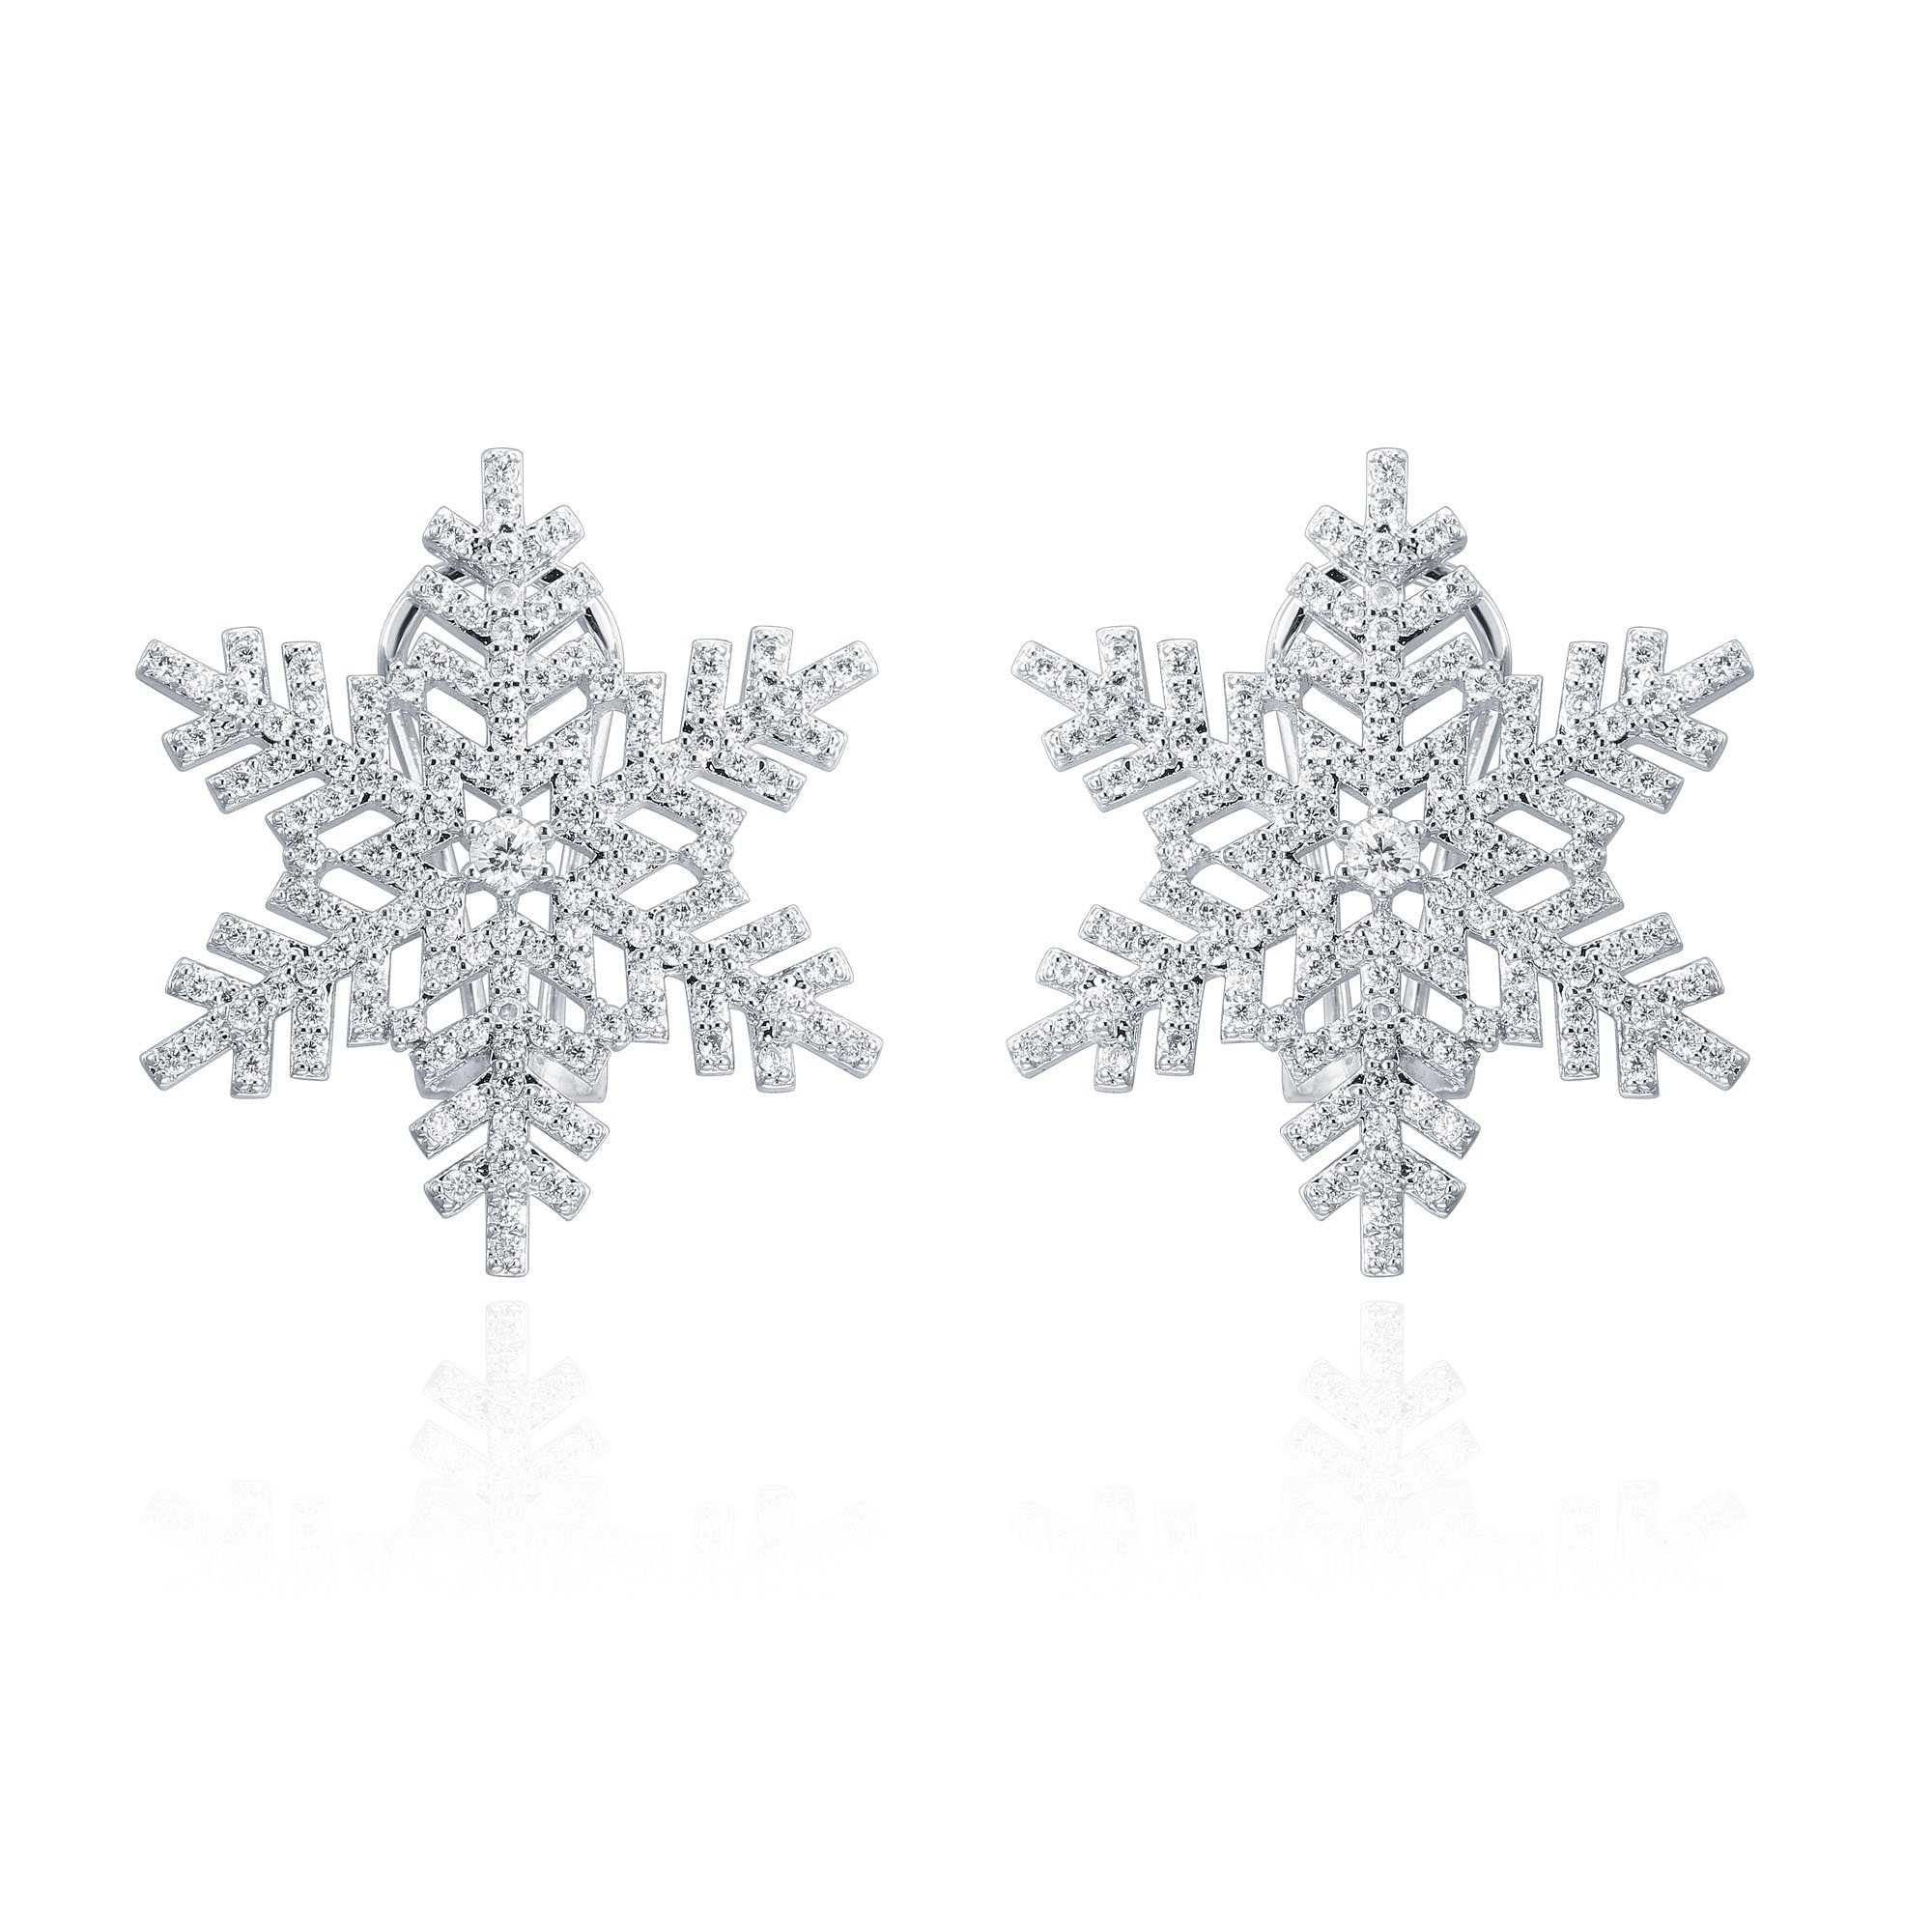 ZS Jewelry New Snowflake Stud Earring Cubic Zirconia Fashion Jewelry For Women